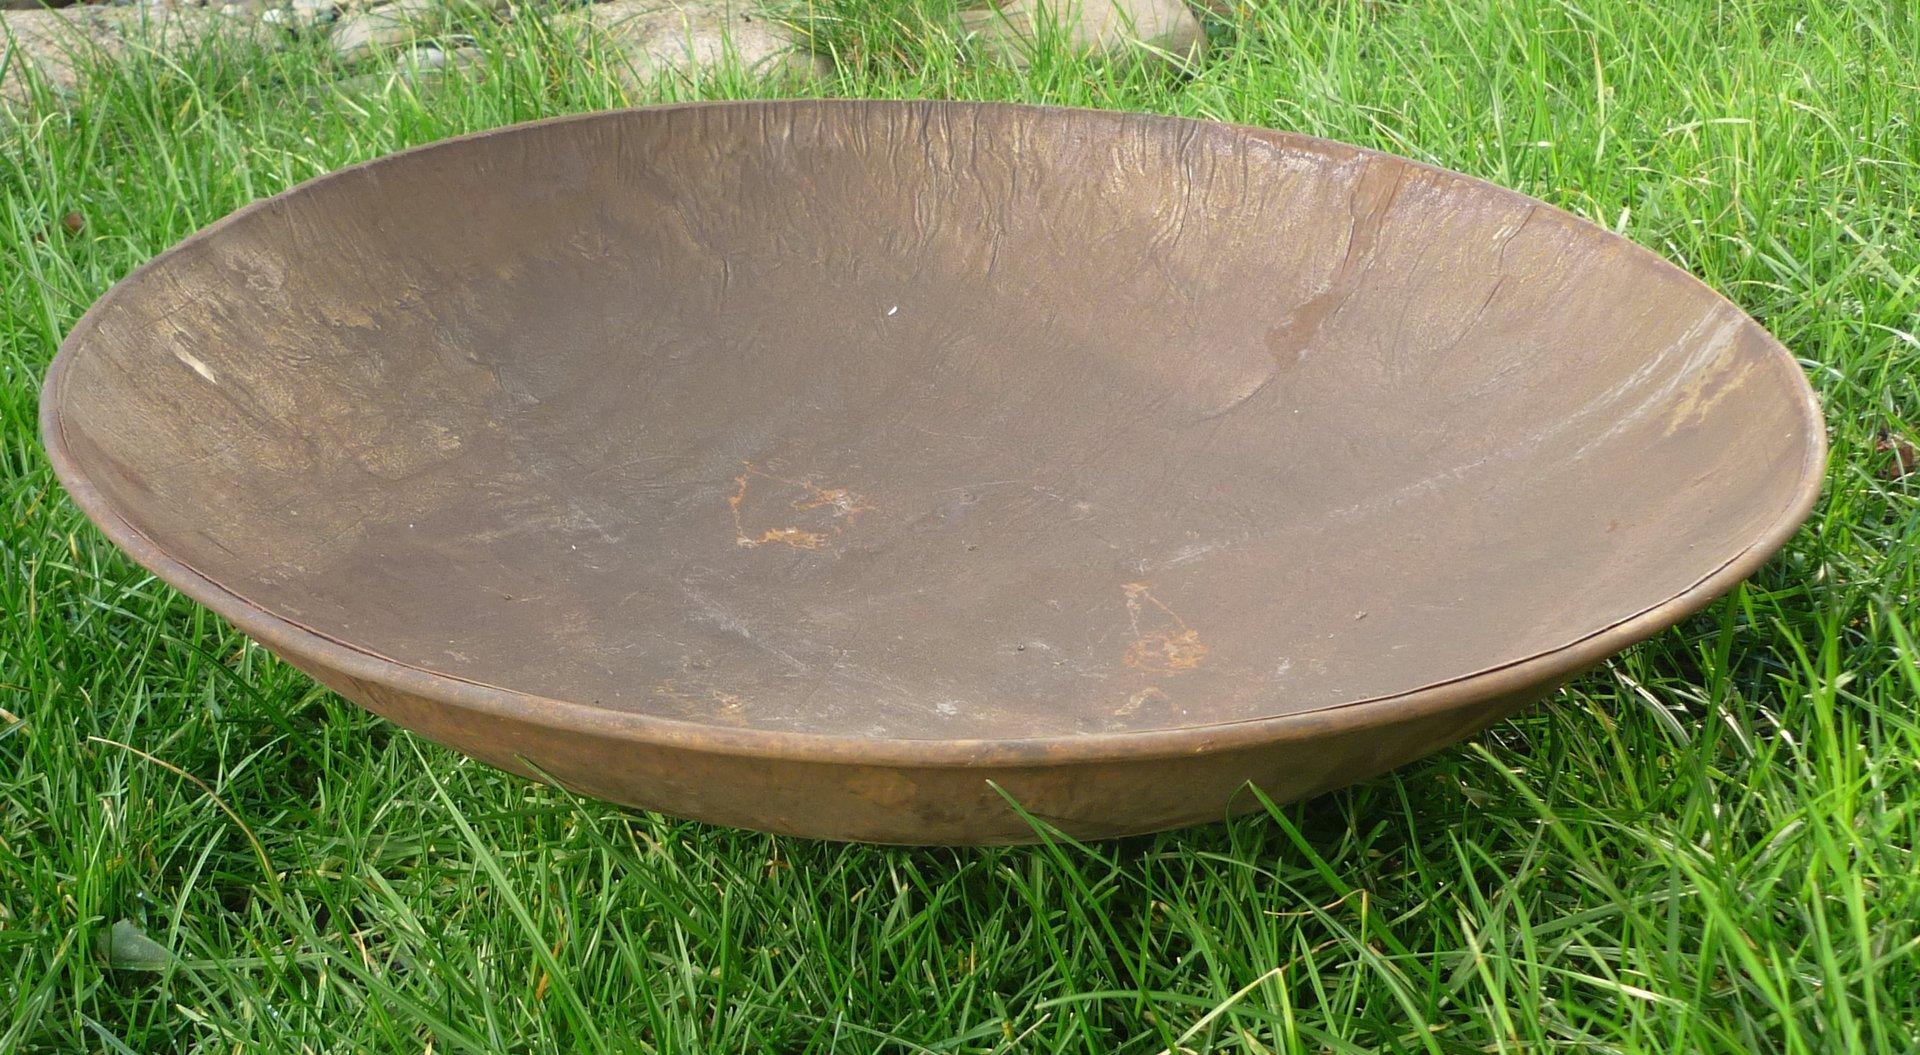 Schale auf kugeln pflanzschale rostoptik edelrost metall for Gartenskulpturen metall rost